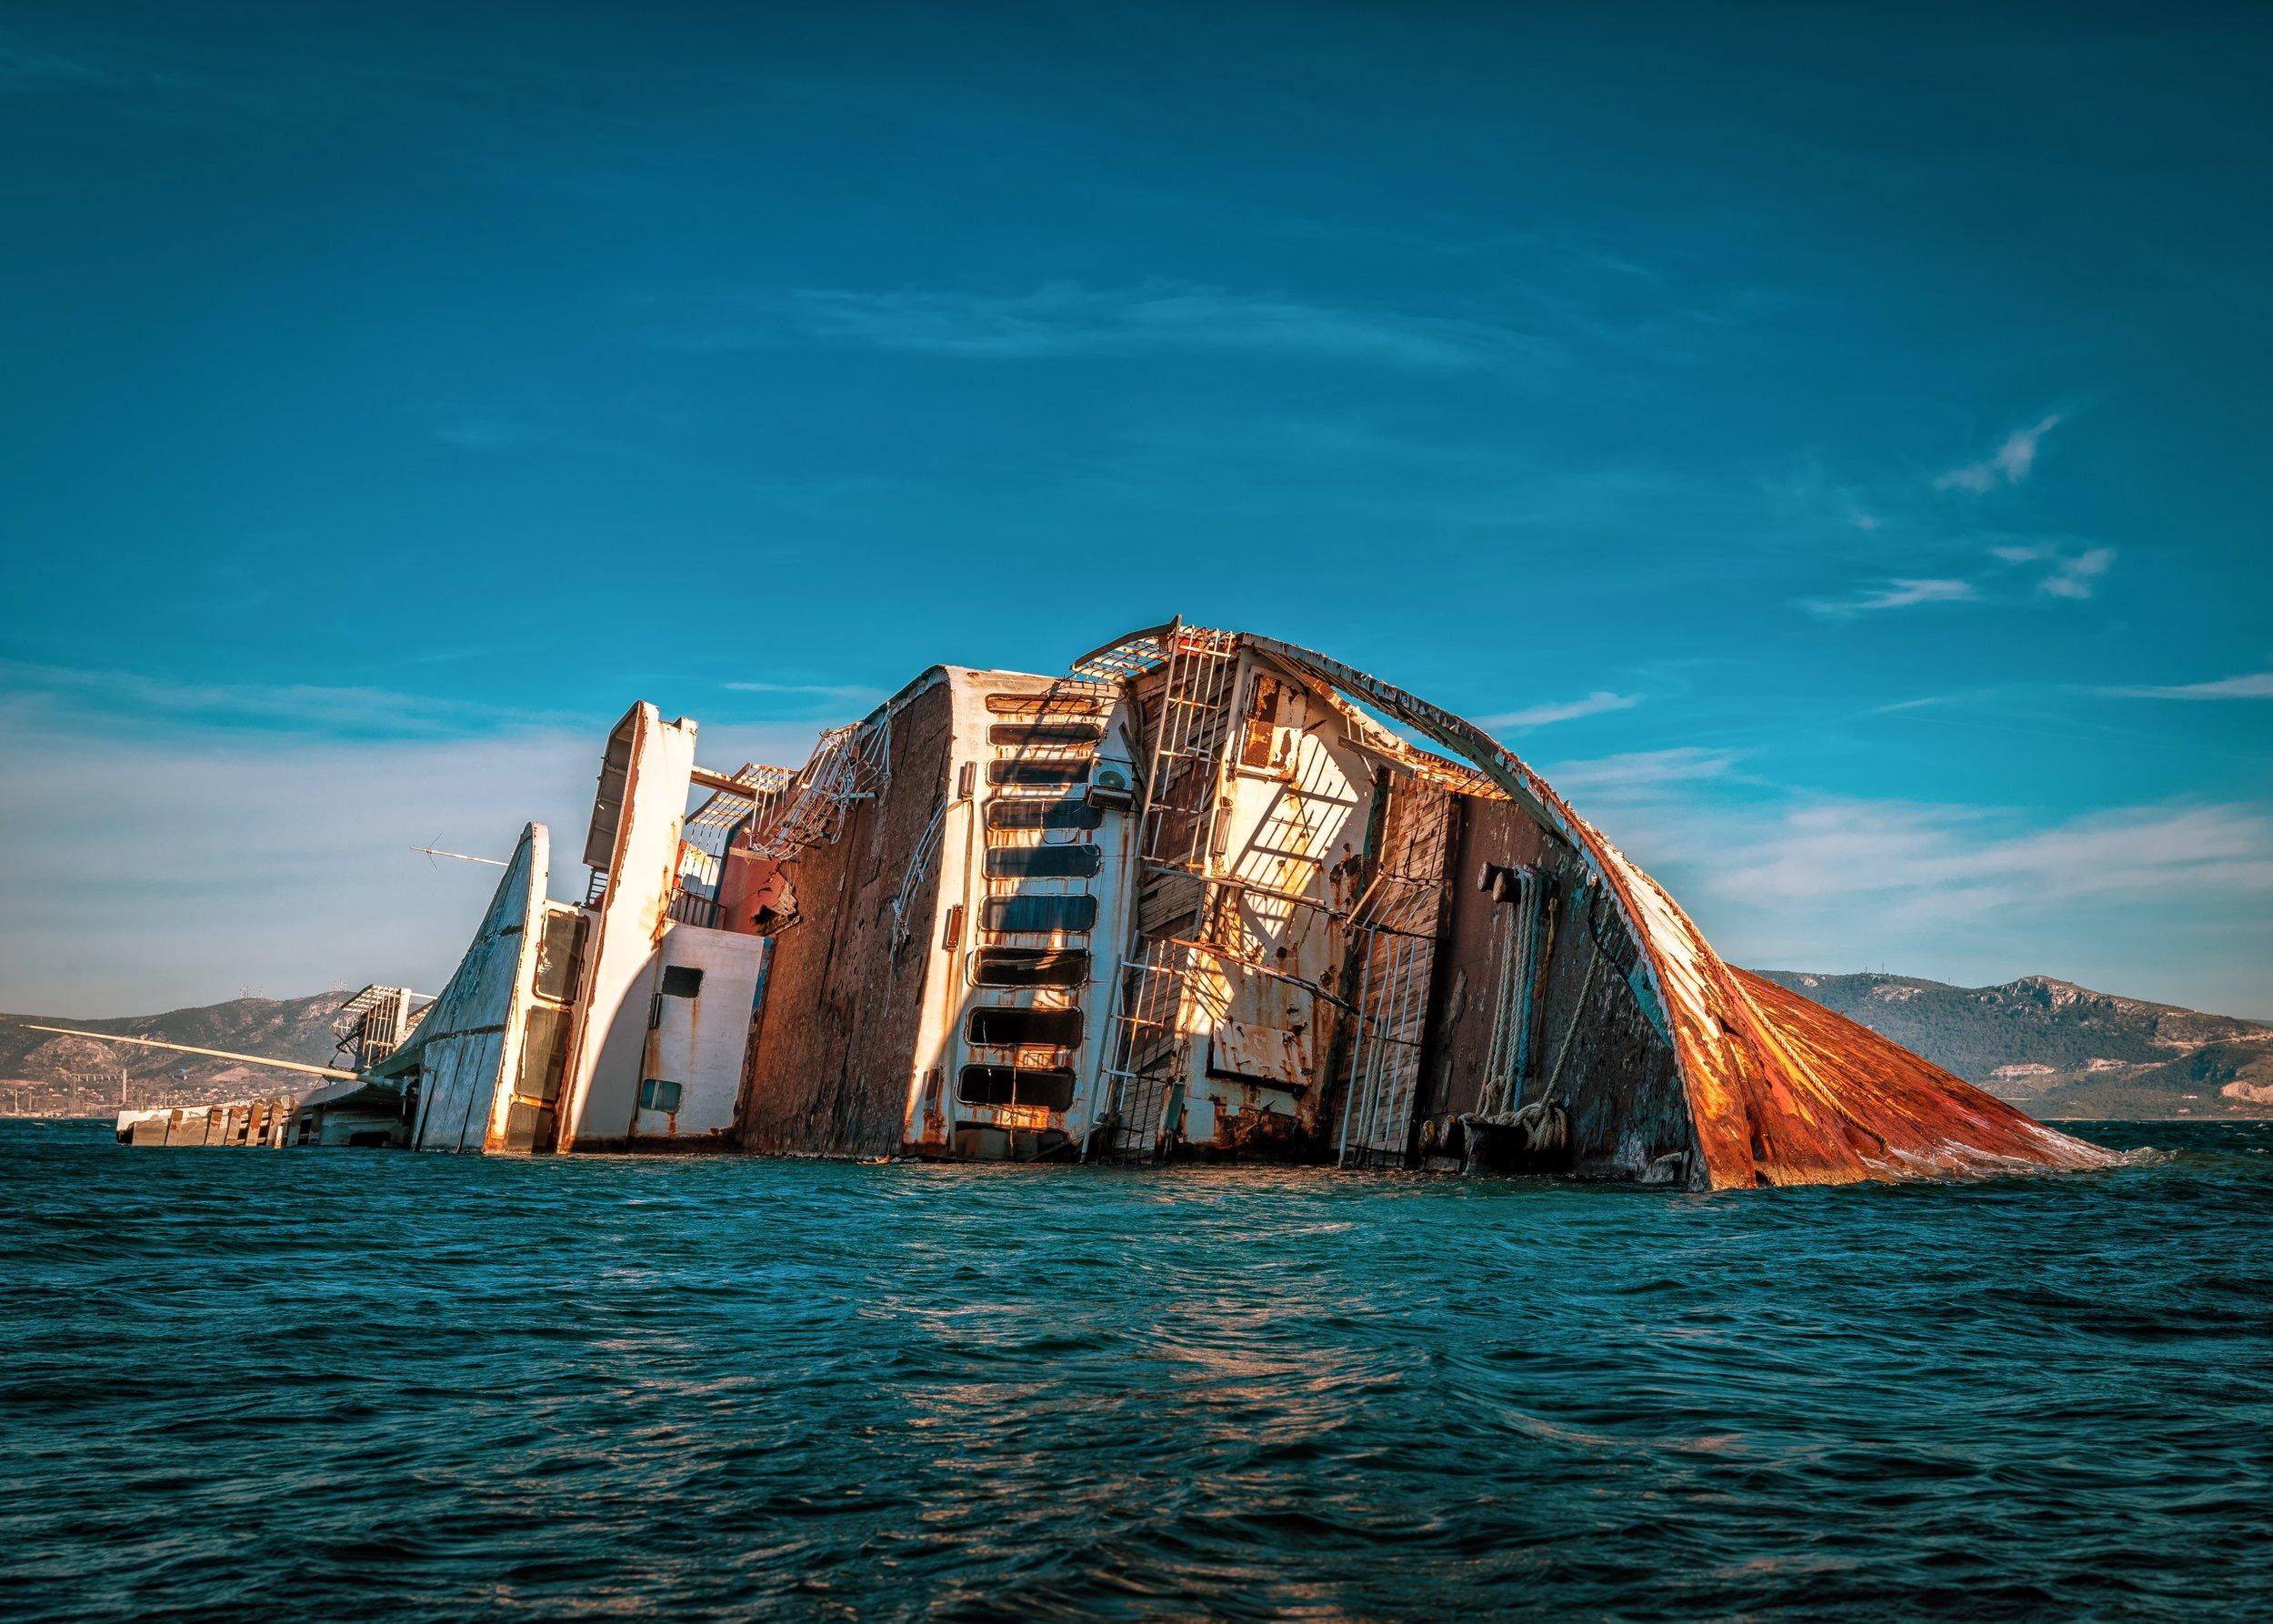 ocean-sea-shipwreck-2056194.jpg